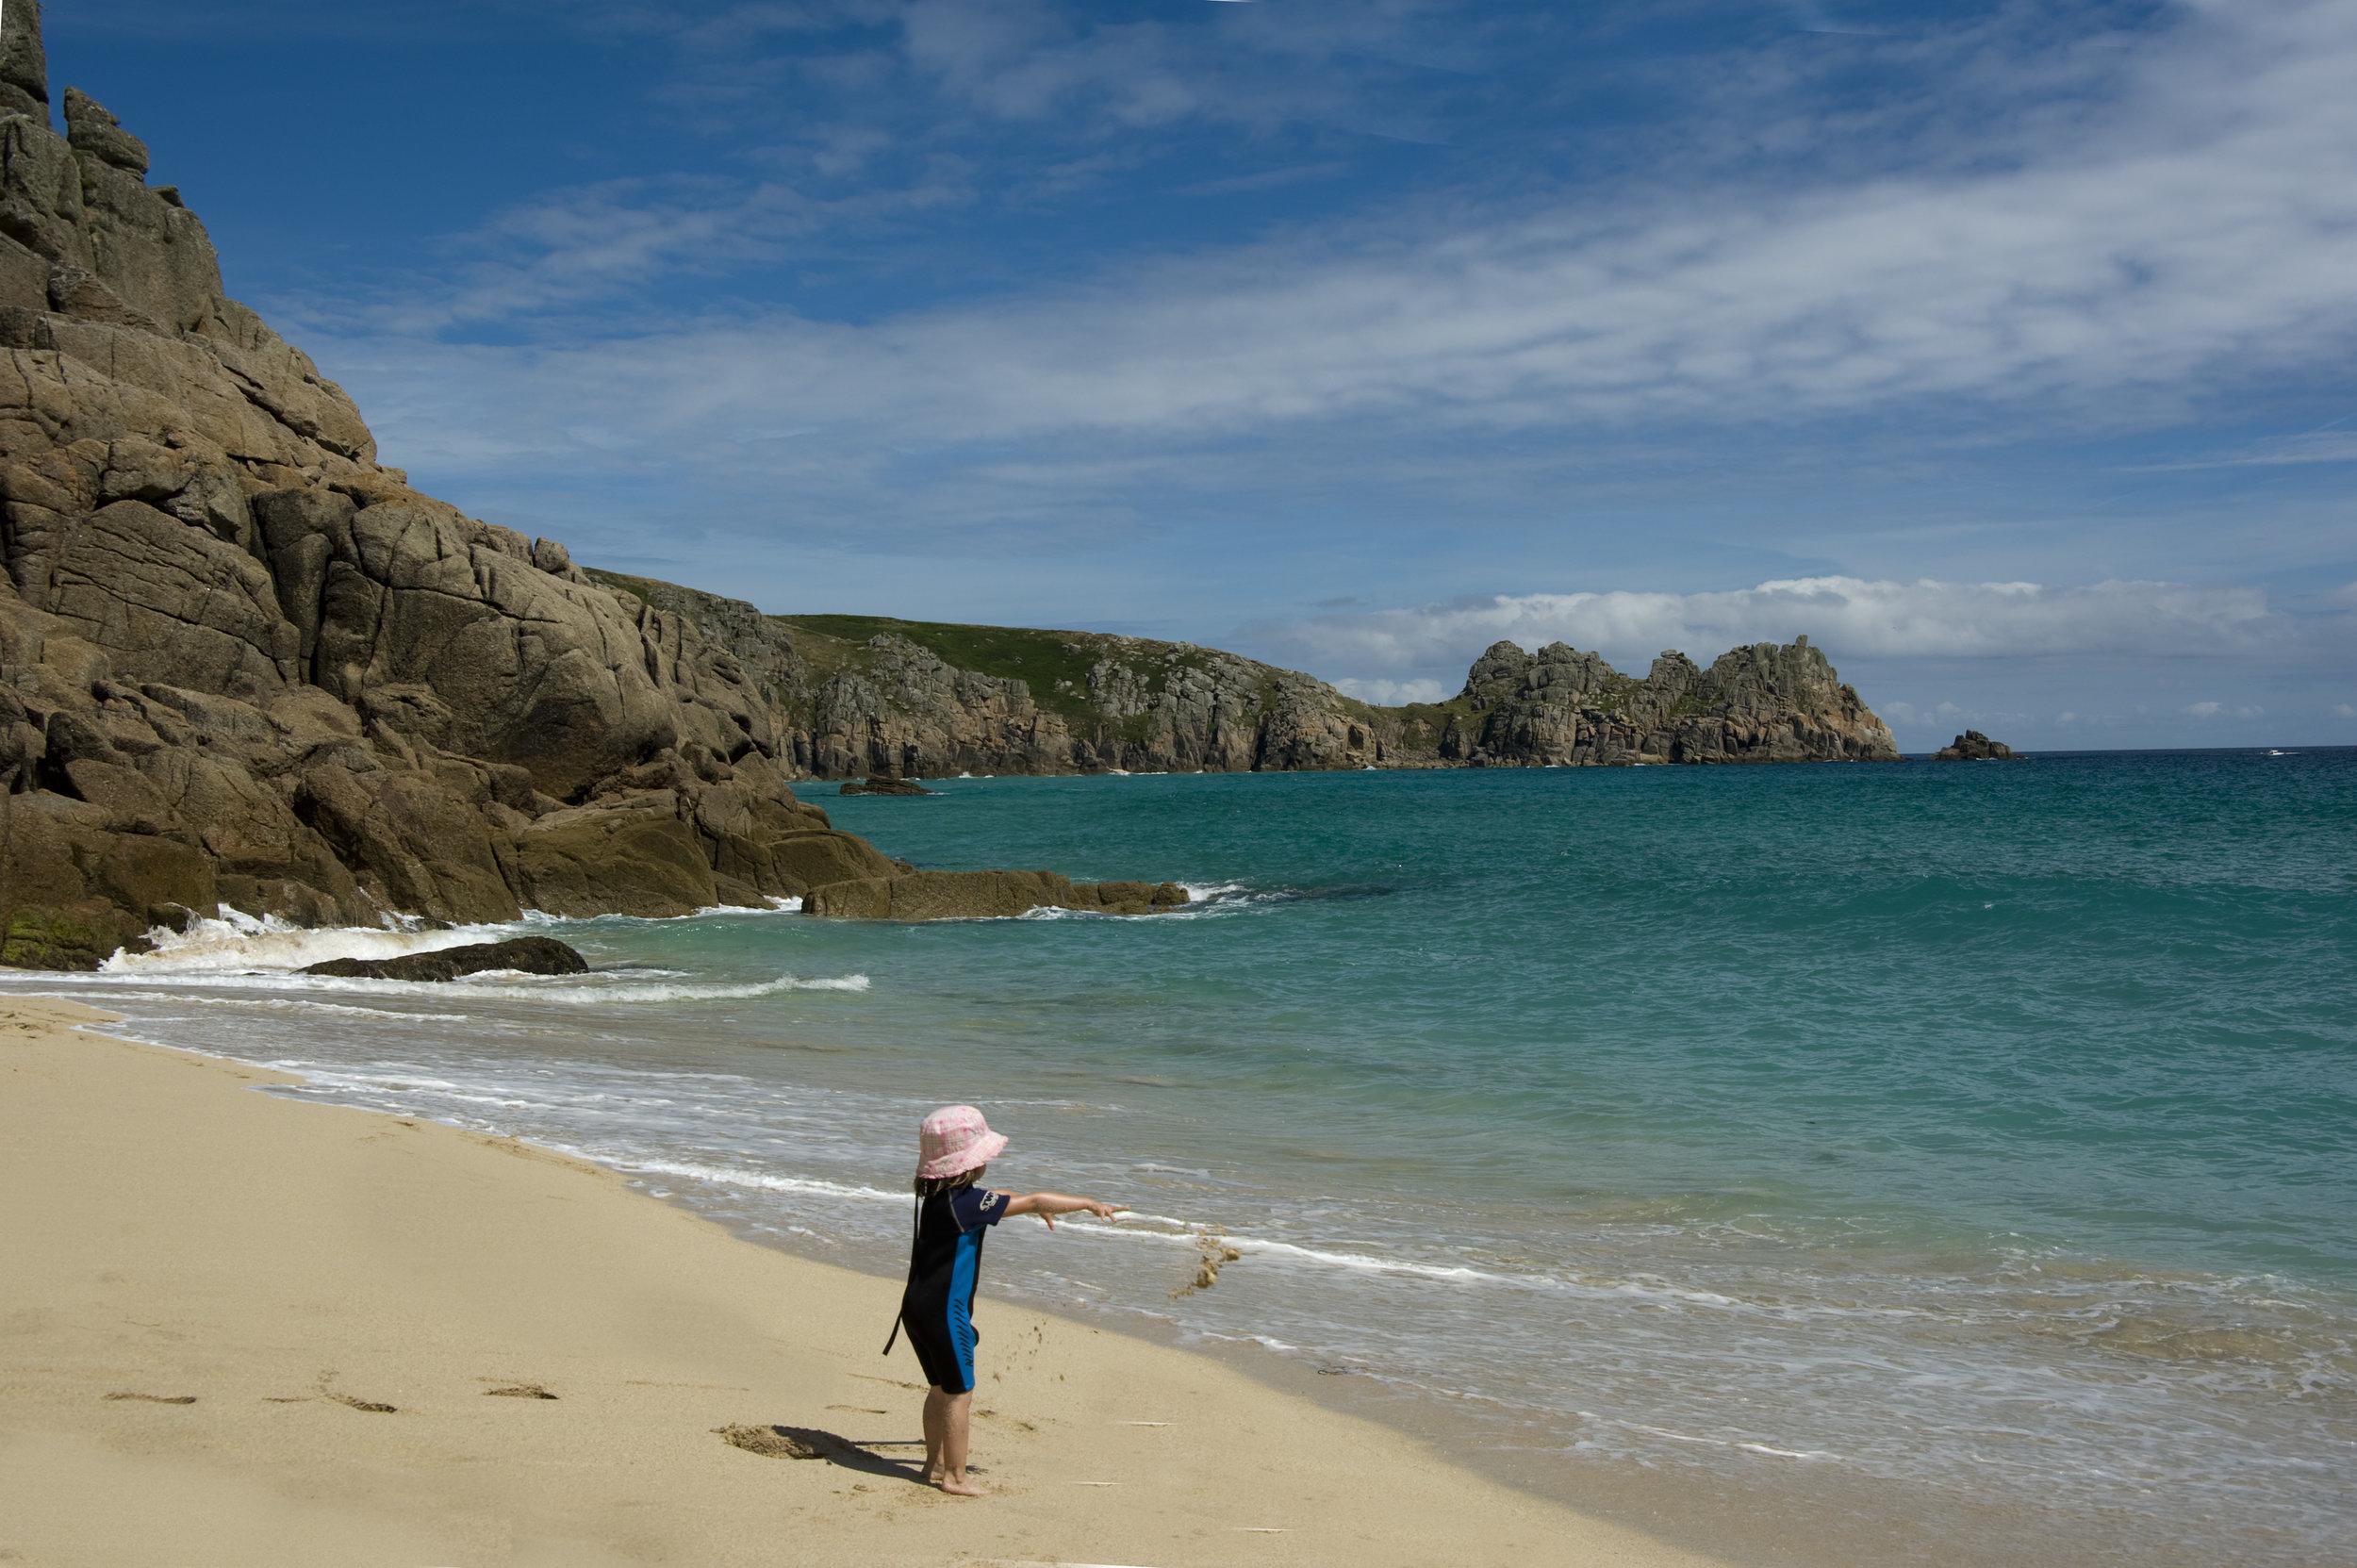 62- Reginald Poad - Beautiful Sands at Porthcurno.jpg